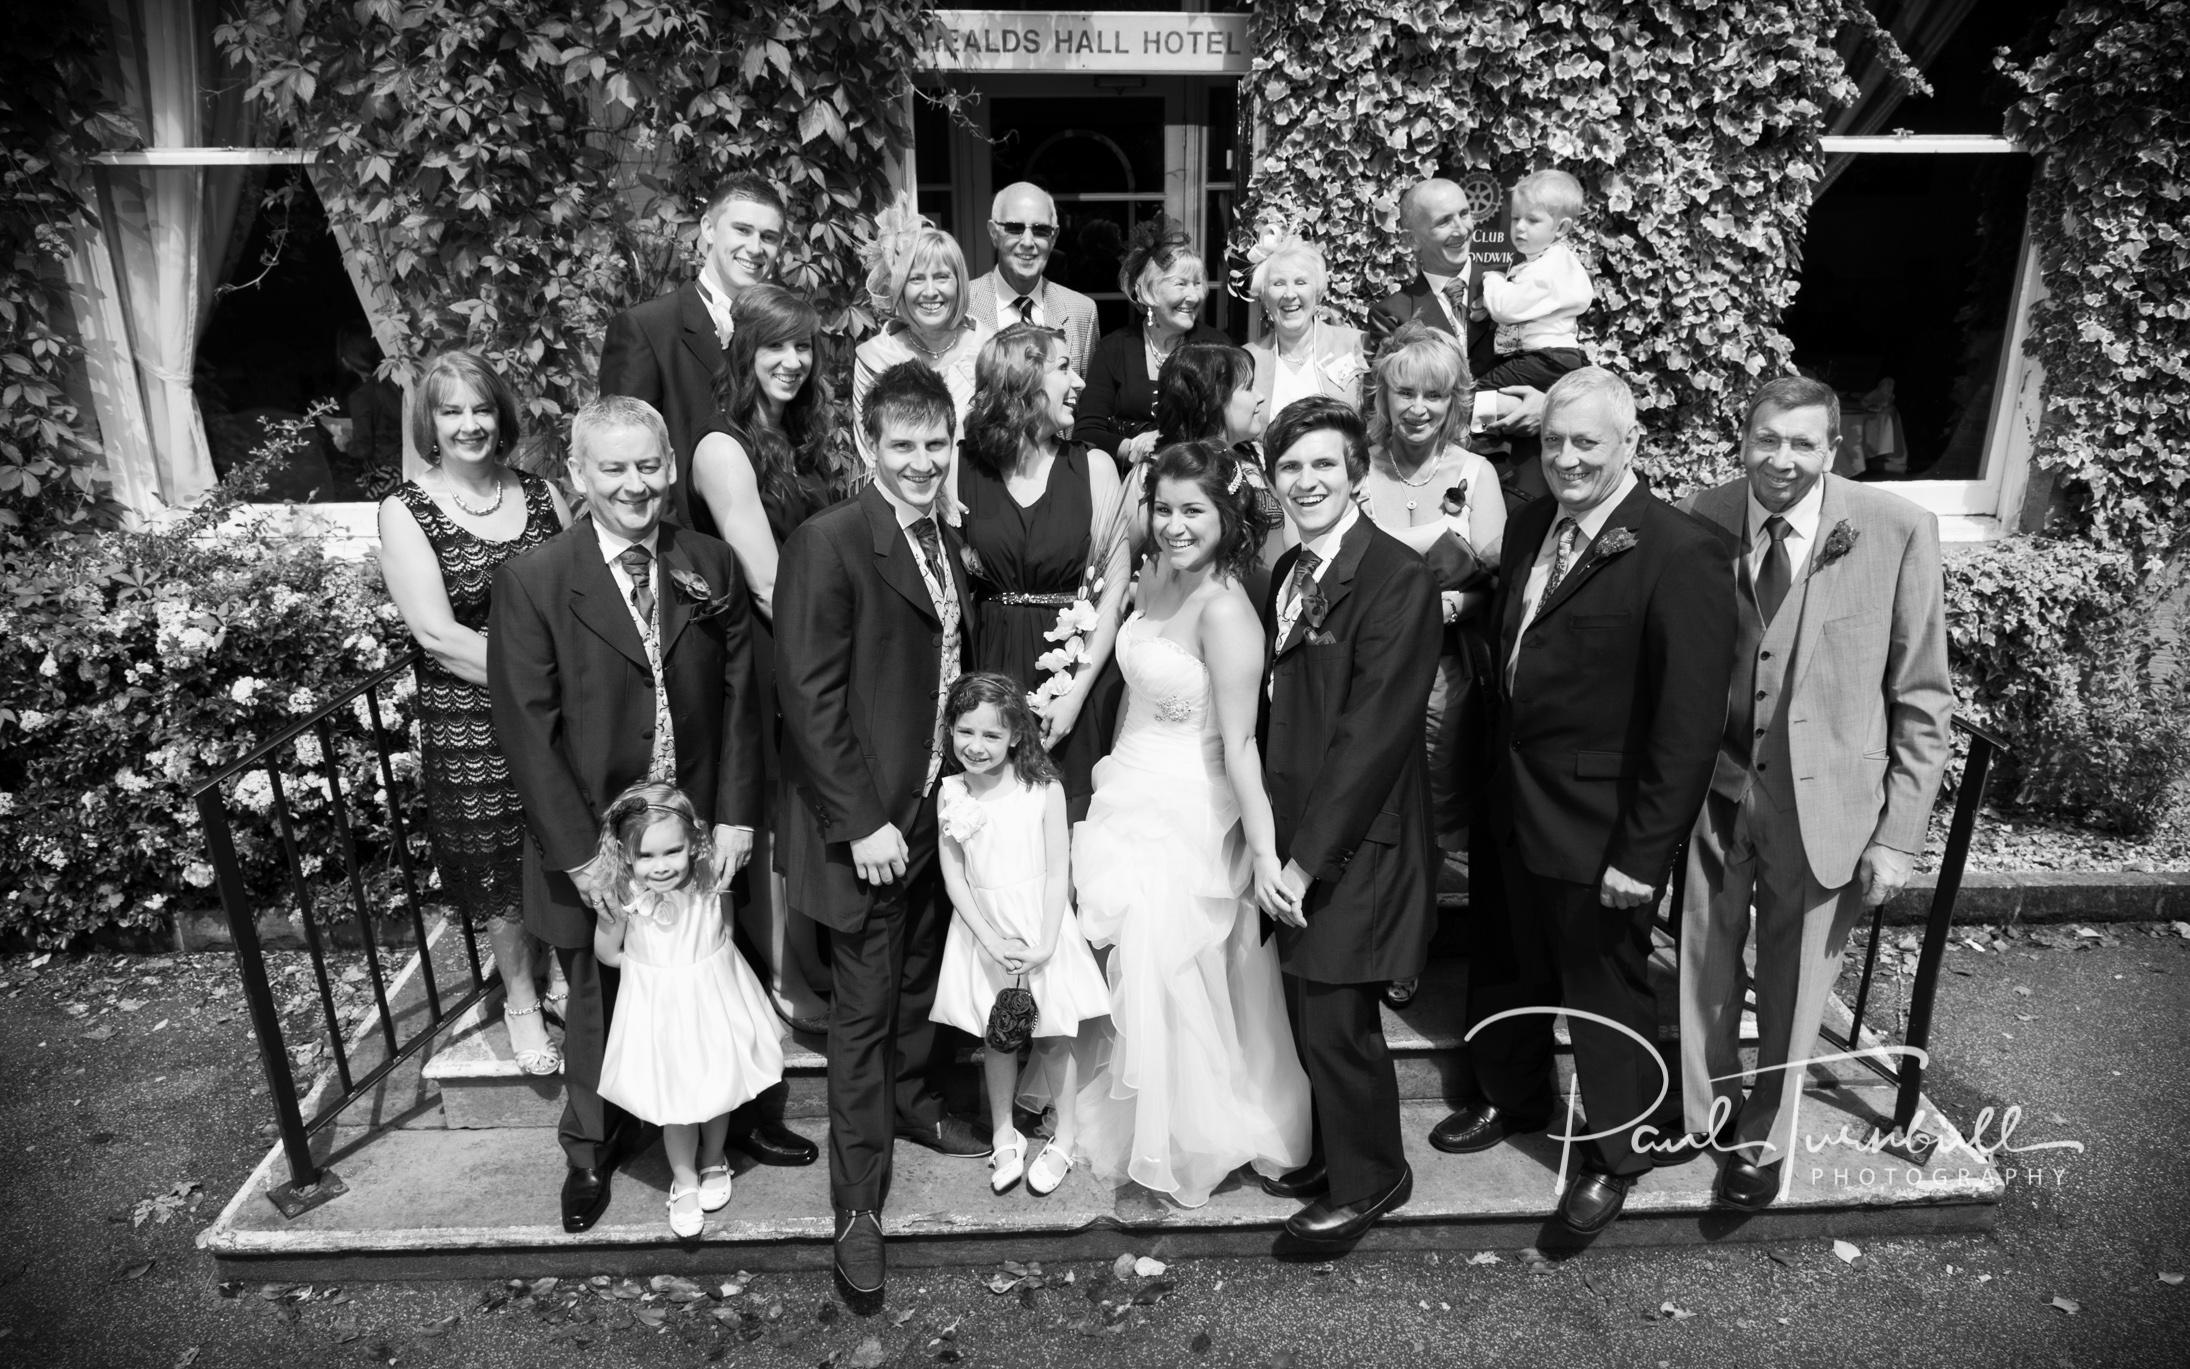 wedding-photography-healds-hall-liversedge-yorkshire-076.jpg